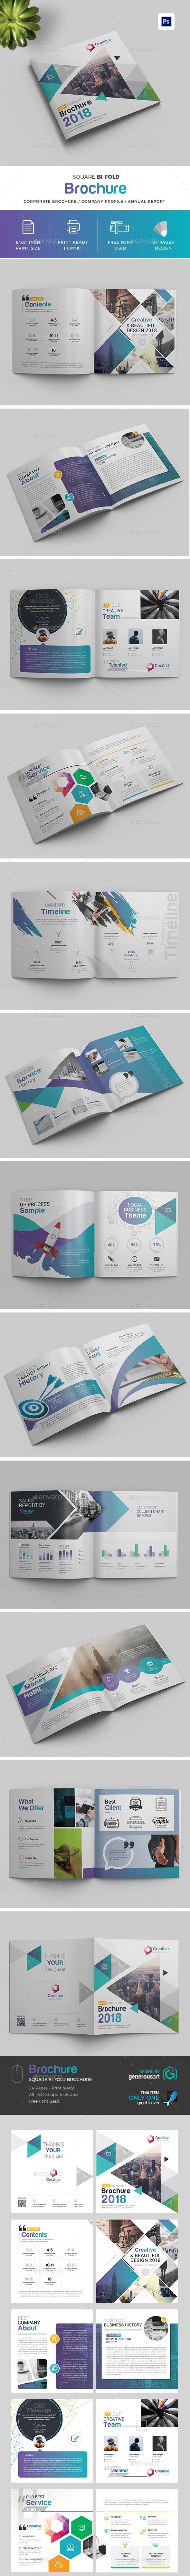 Square Bi-Fold Brochure - Brochures Print Templates